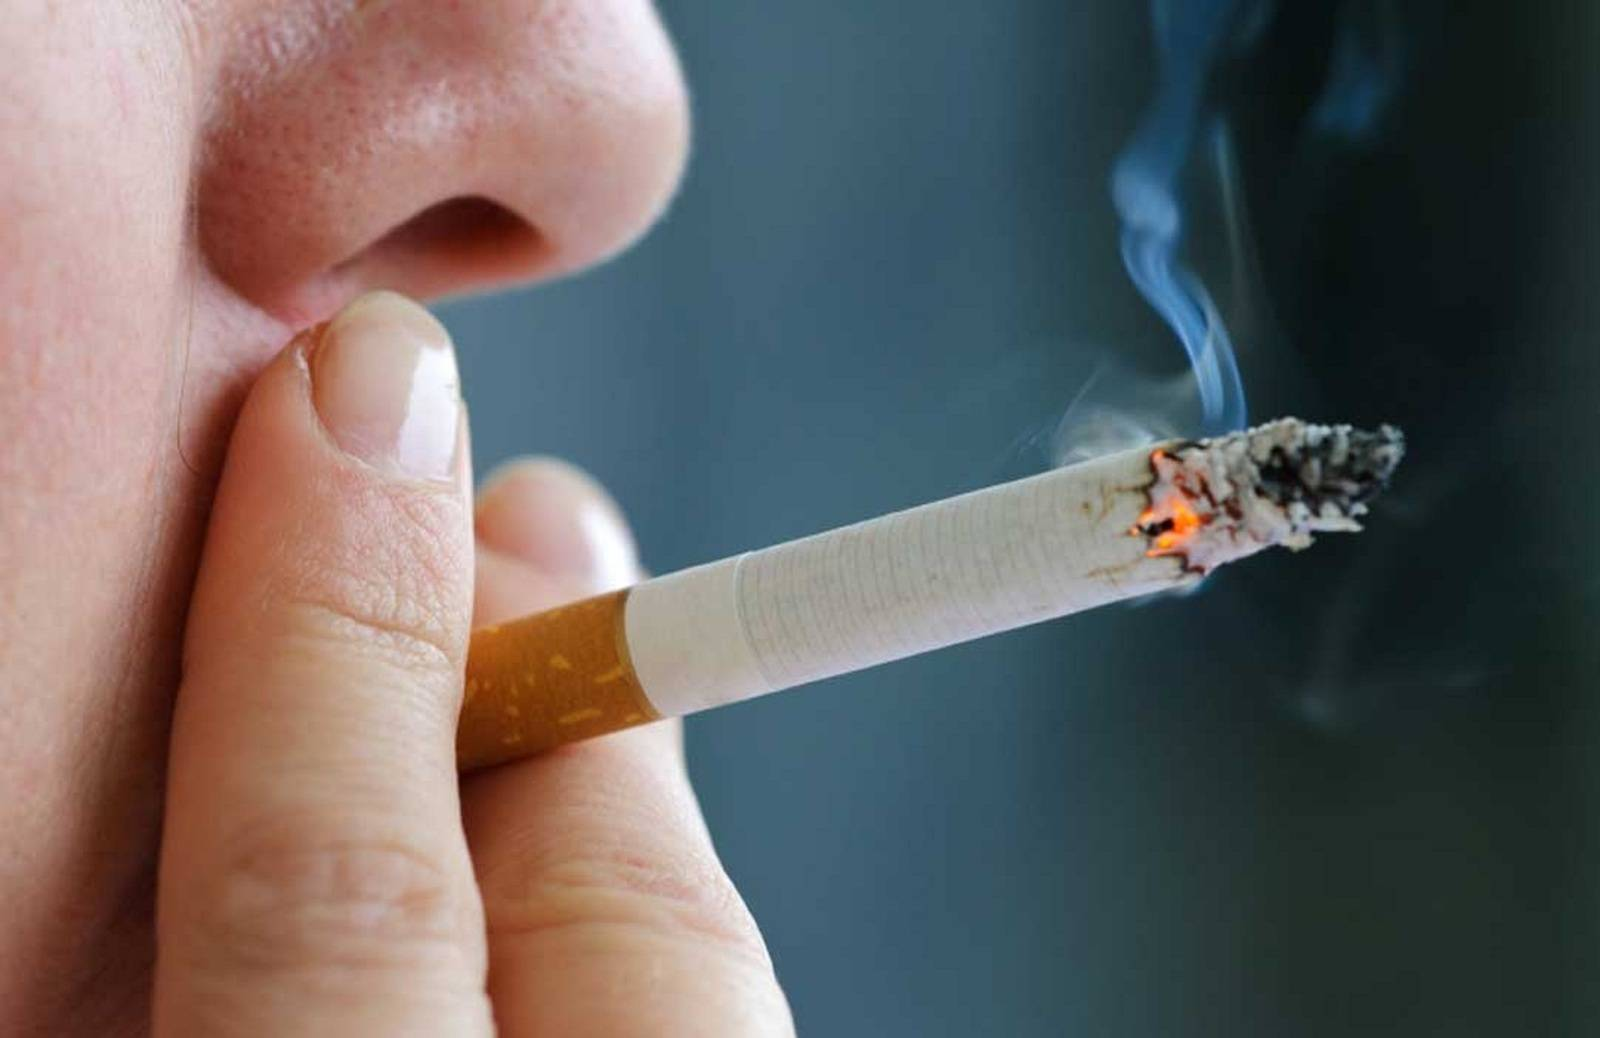 Сигареты и кишечник